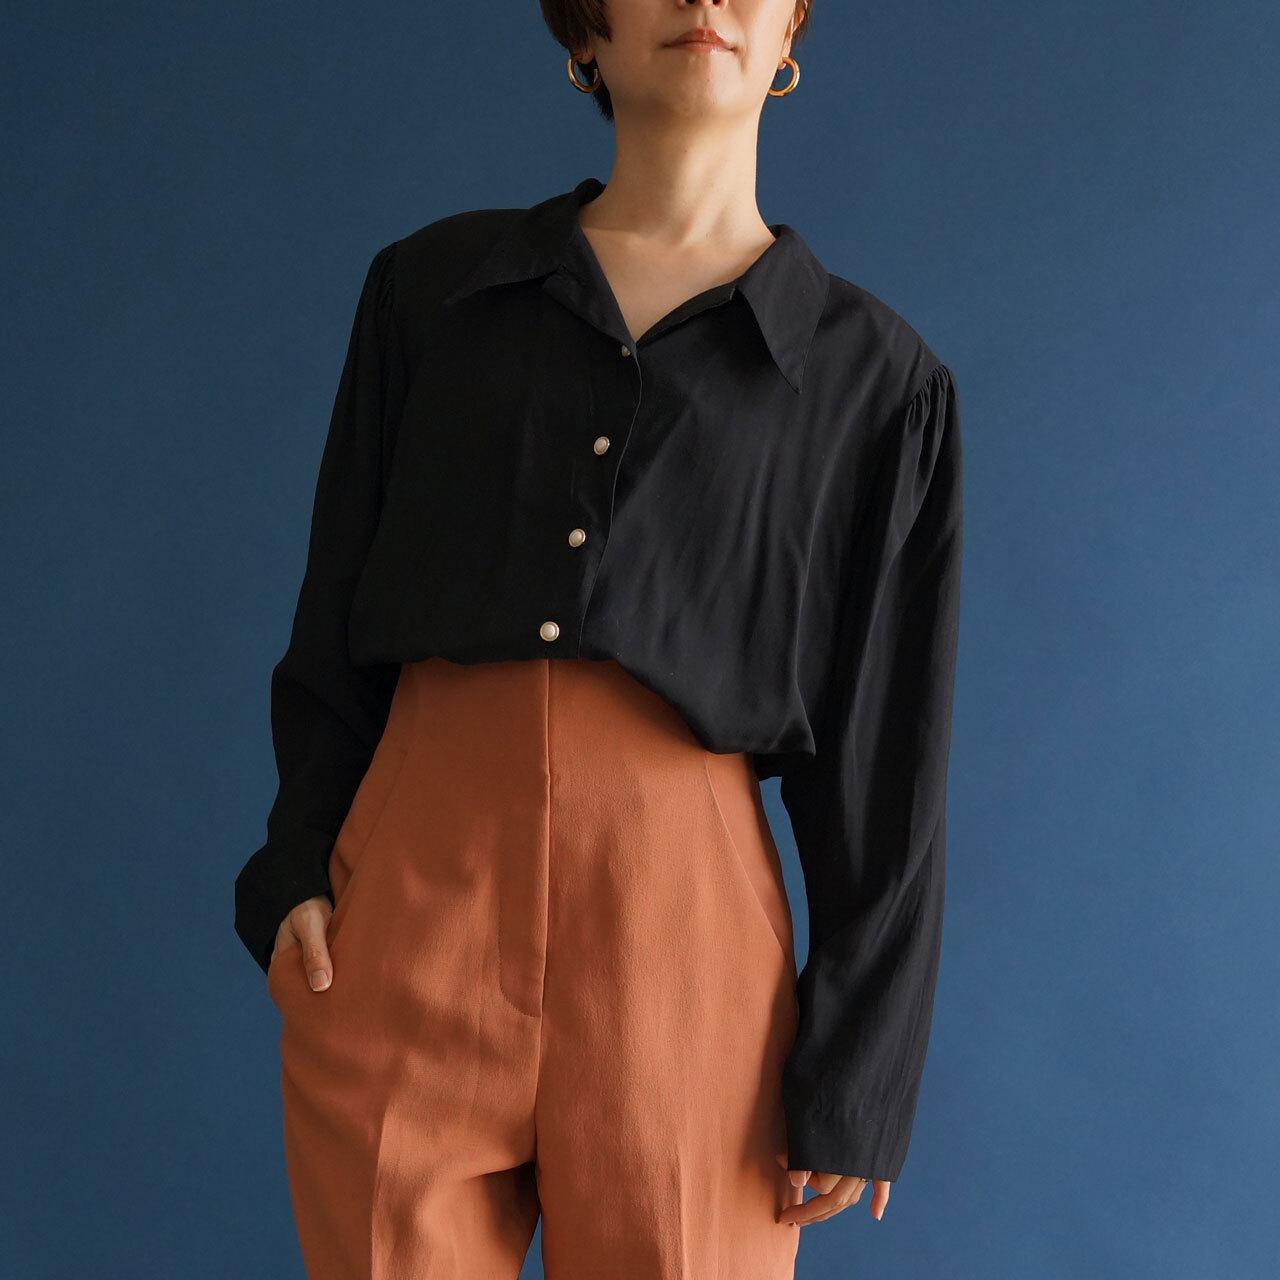 【POP UP出店予定】80's-90's vintage black blouse long sleeve(80年〜90年代  古着 ブラック ロングスリーブ ブラウス)